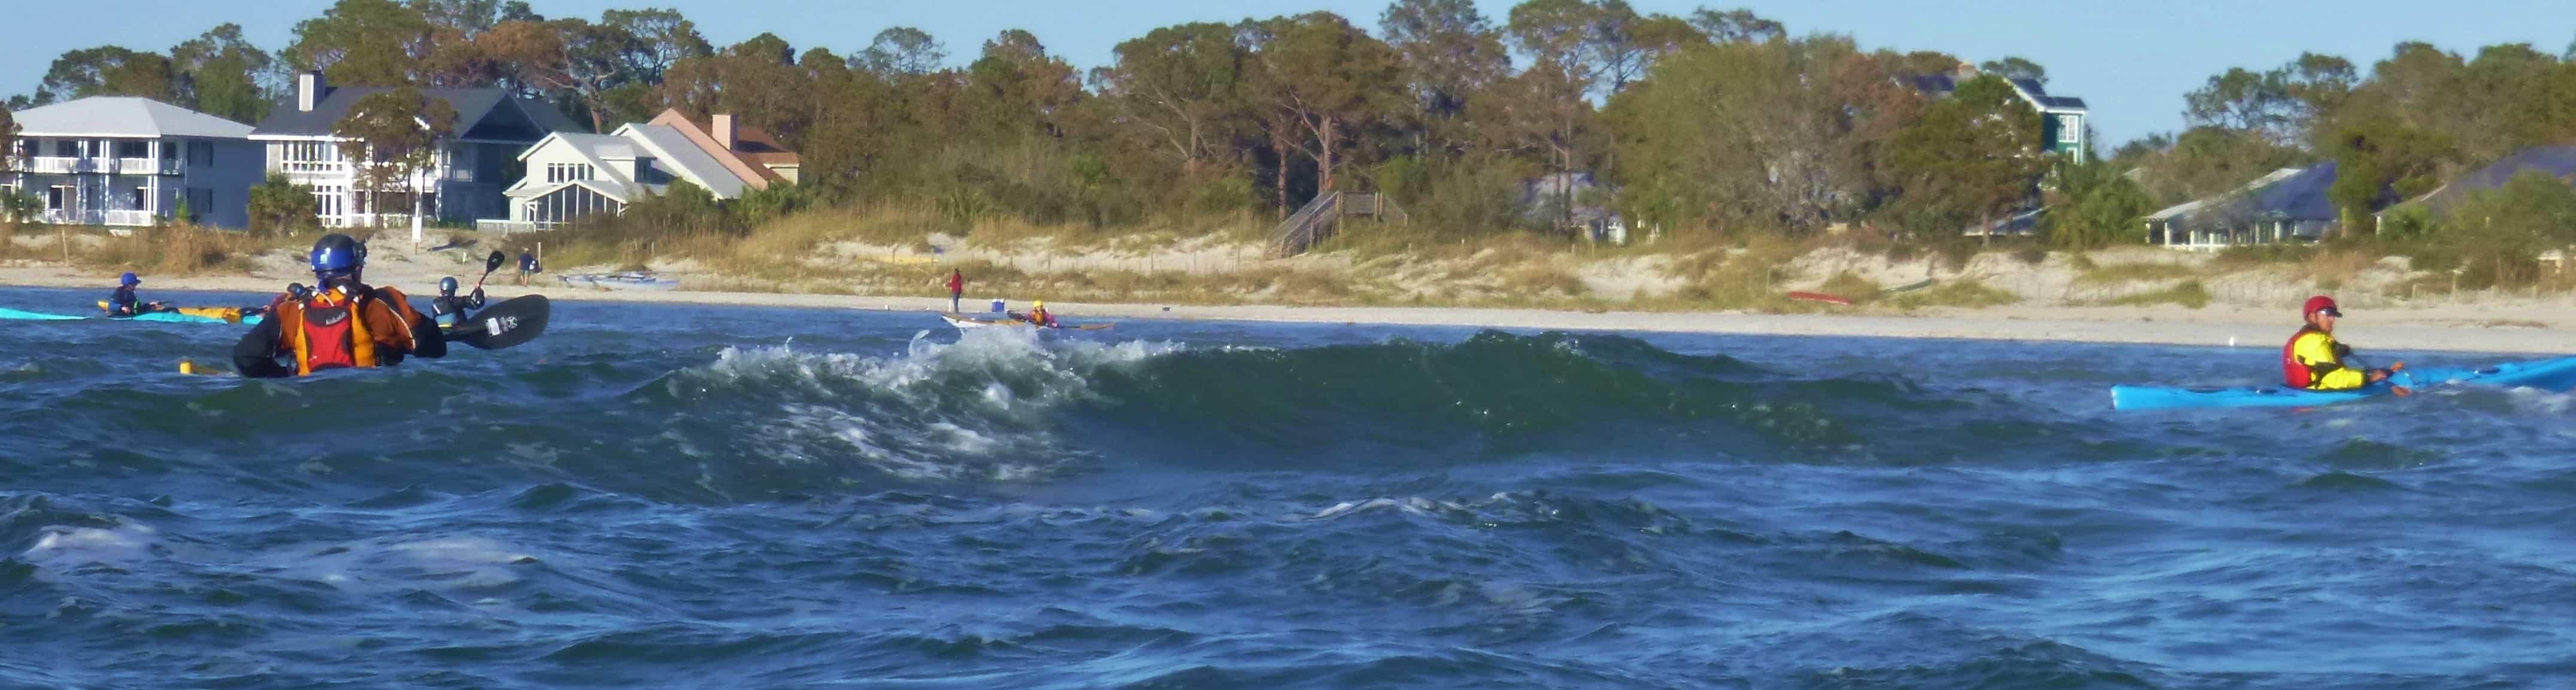 Tybee Island Ocean Skills Week playing in the Triangle